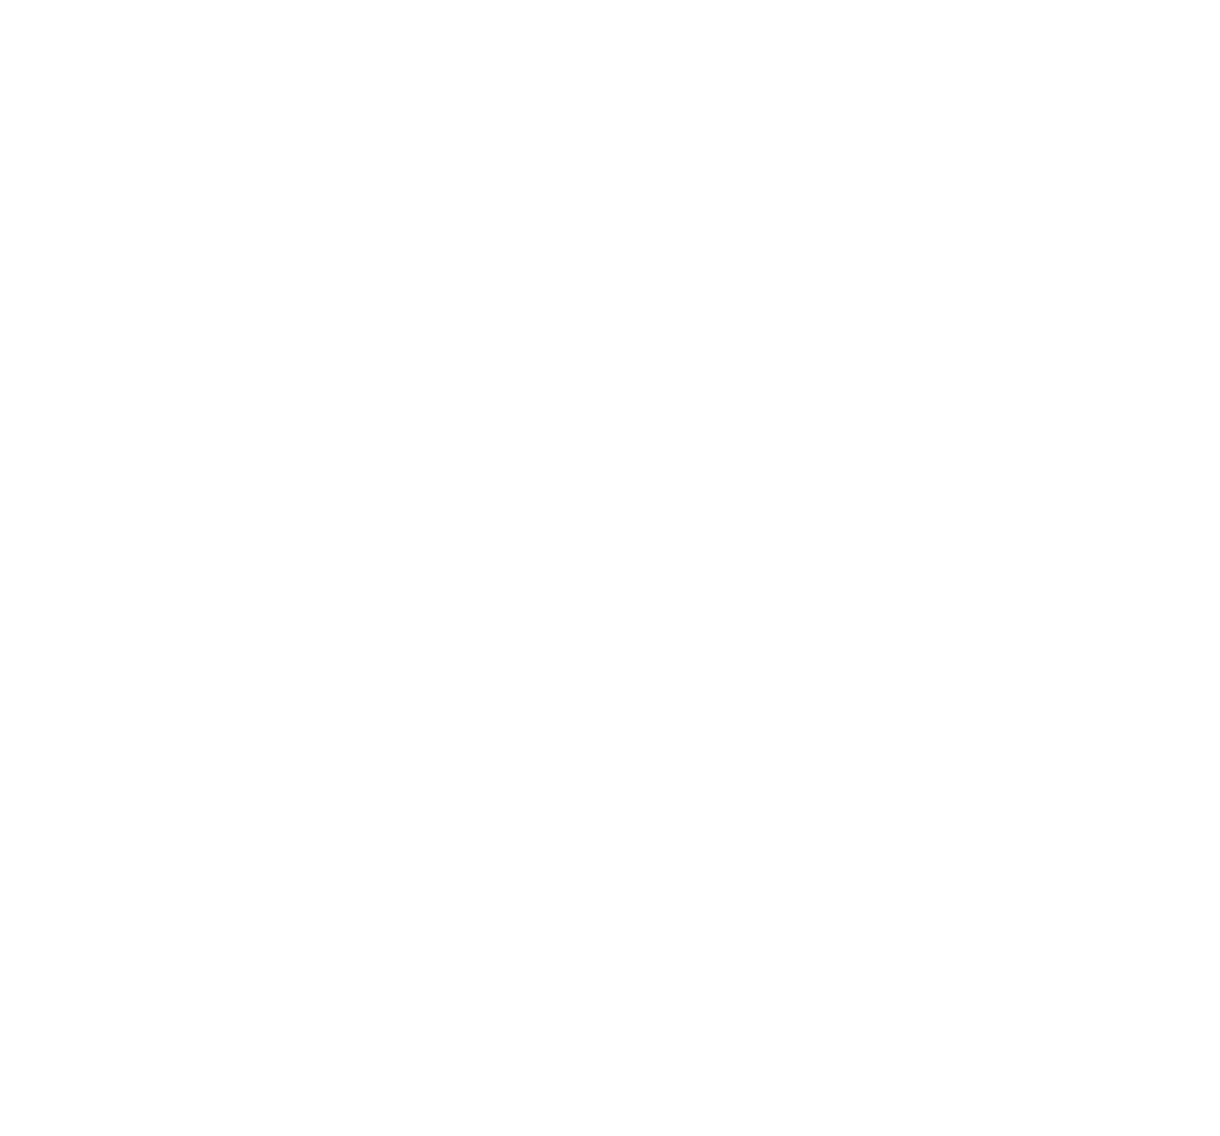 panama-flag-button